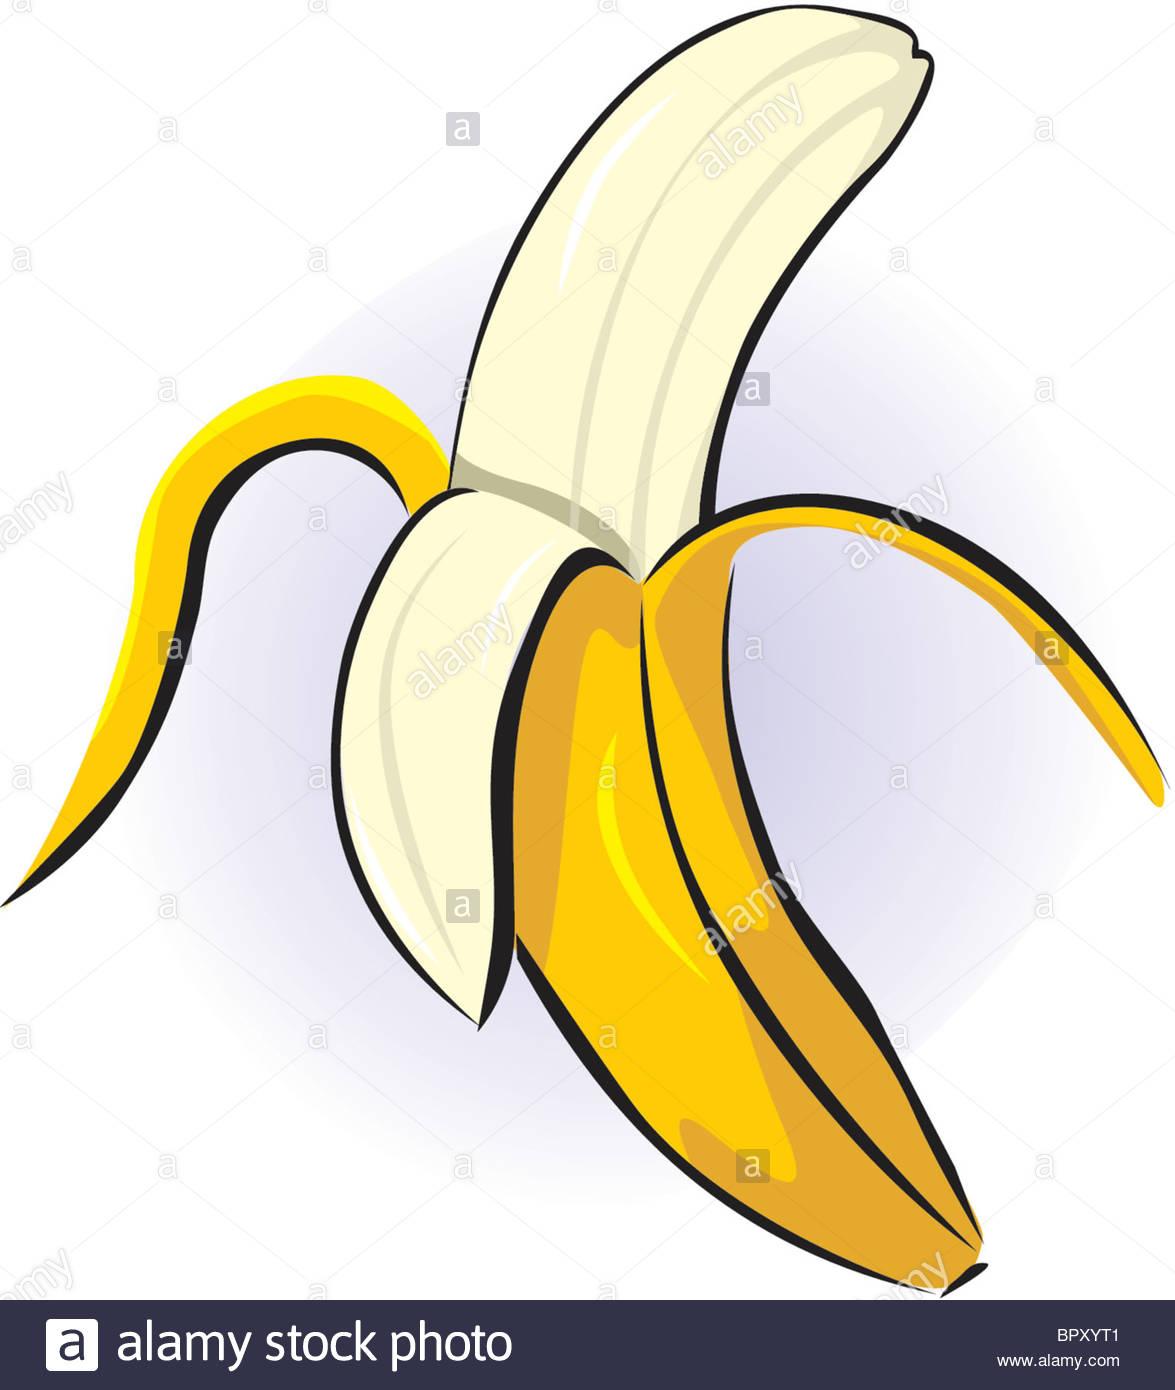 1175x1390 Drawing Of A Peeled Banana Stock Photo 31325393